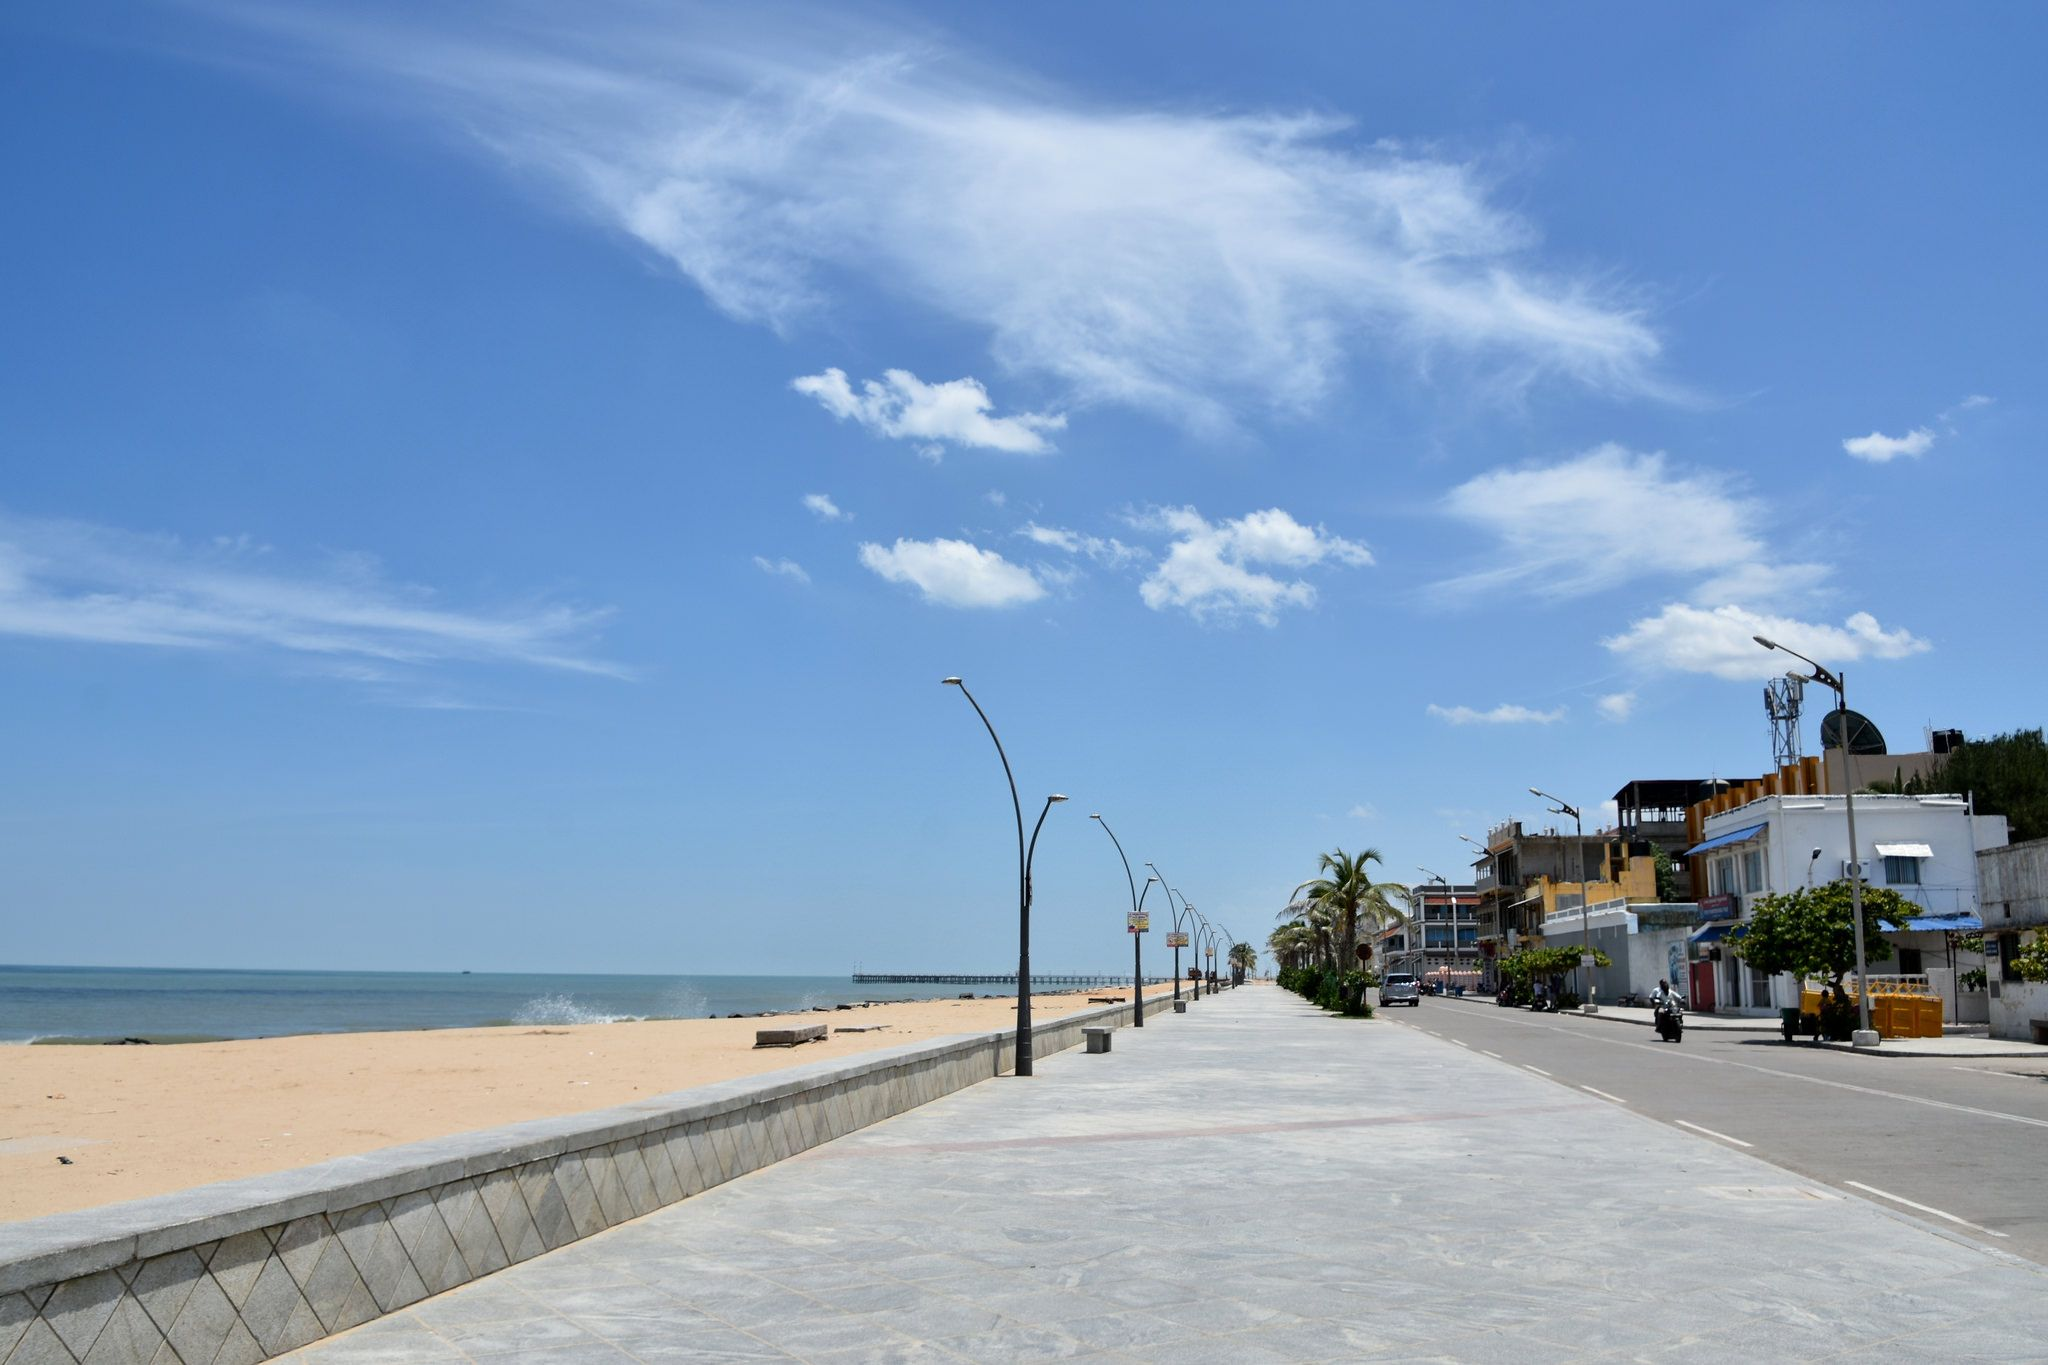 Promenade beach beach outdoor water